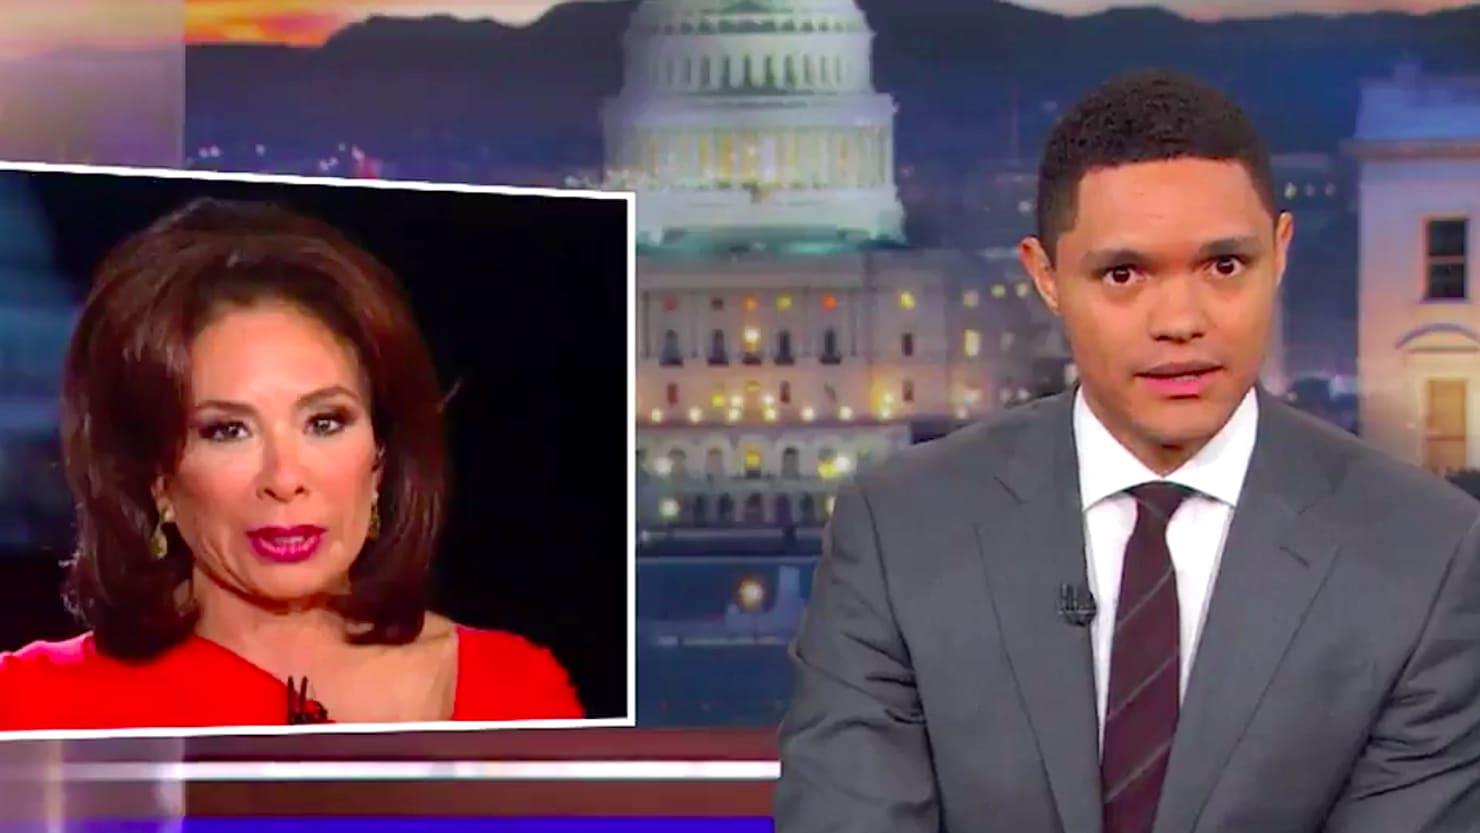 'Daily Show's' Trevor Noah Compares Fox News' Jeanine Pirro to North Korean Propaganda